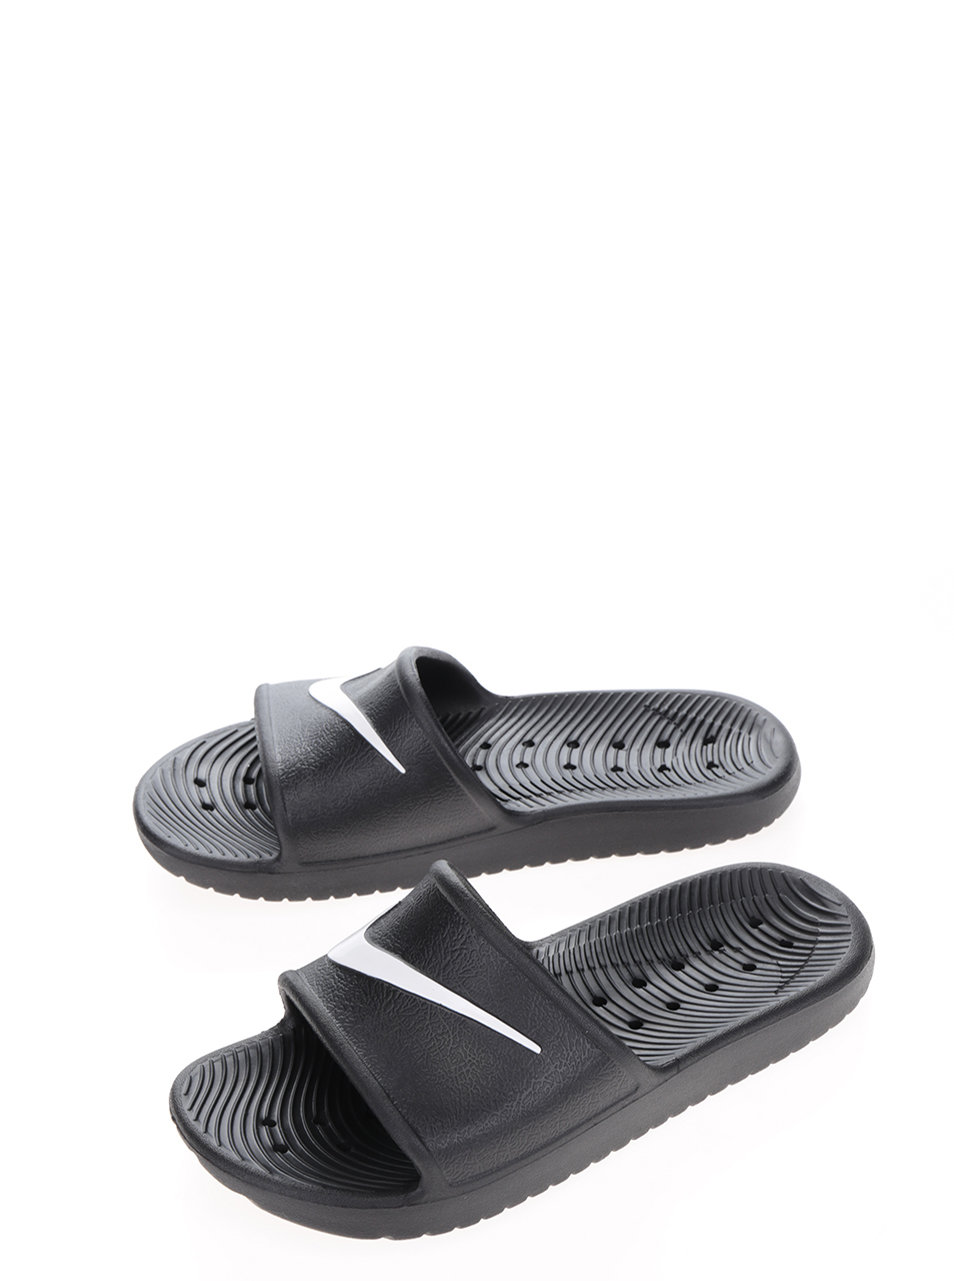 85f85aca618ad Čierne dámske šľapky Nike Kawa Shower | ZOOT.sk